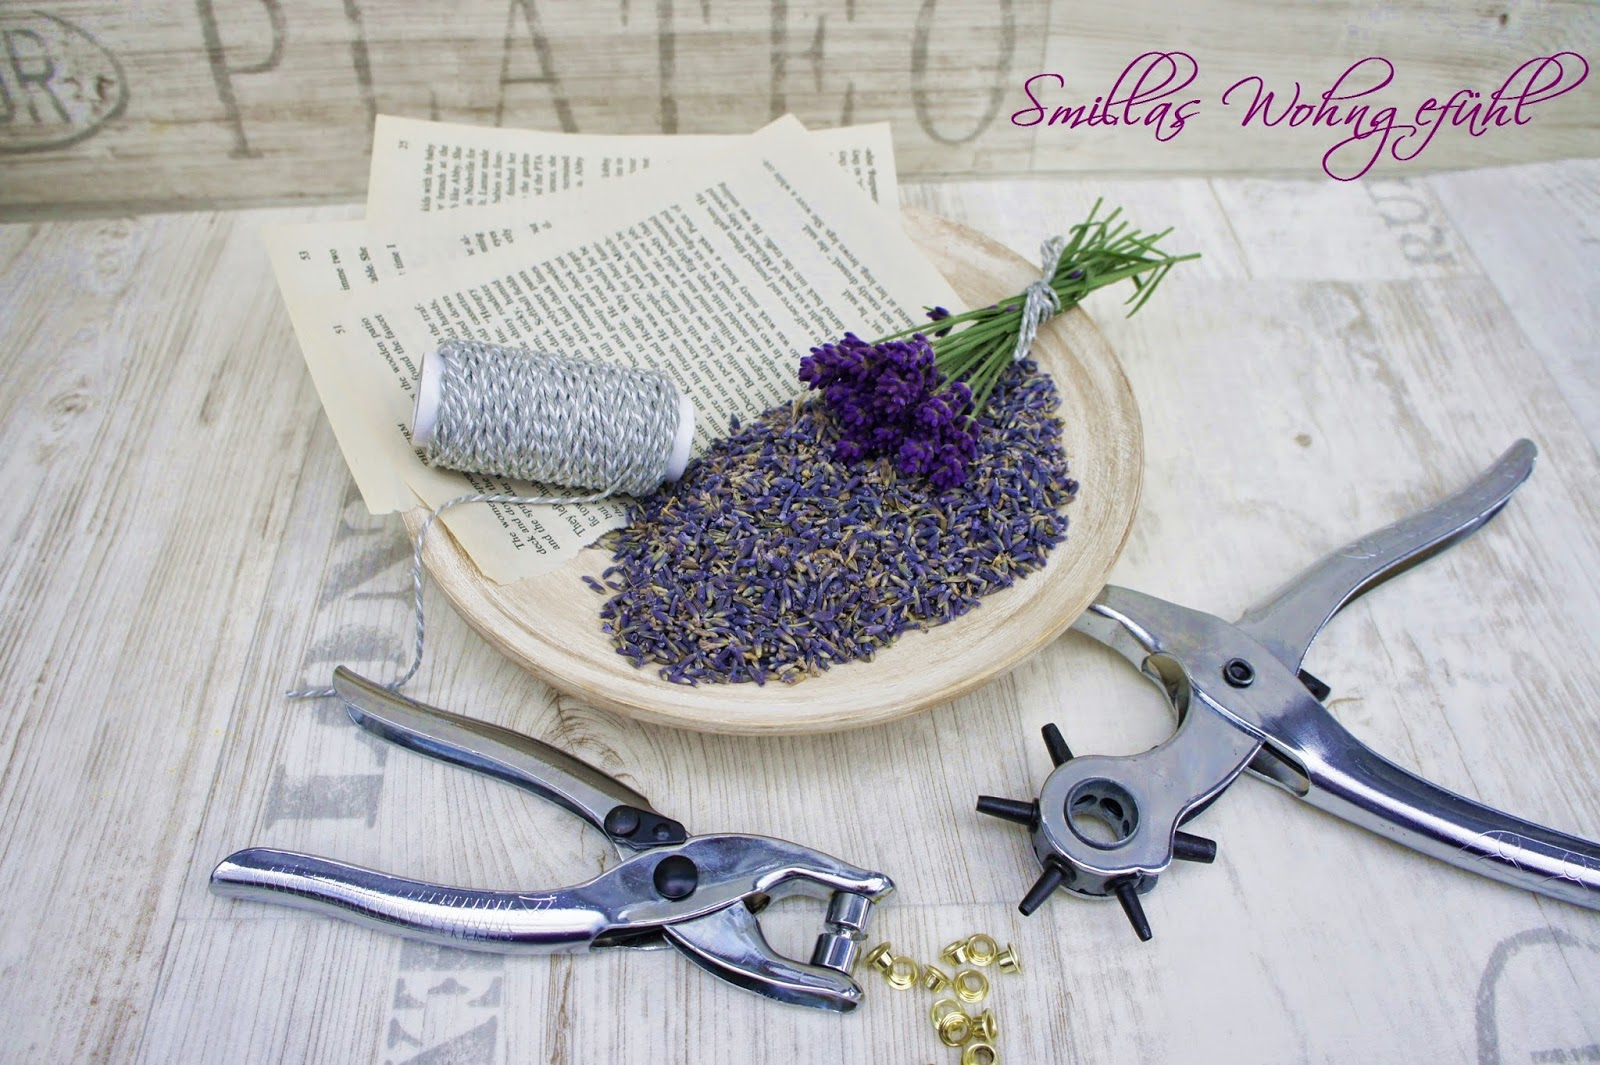 smillas wohngef hl diy scented teabags oder was lavendel im teebeutel zu suchen hat. Black Bedroom Furniture Sets. Home Design Ideas